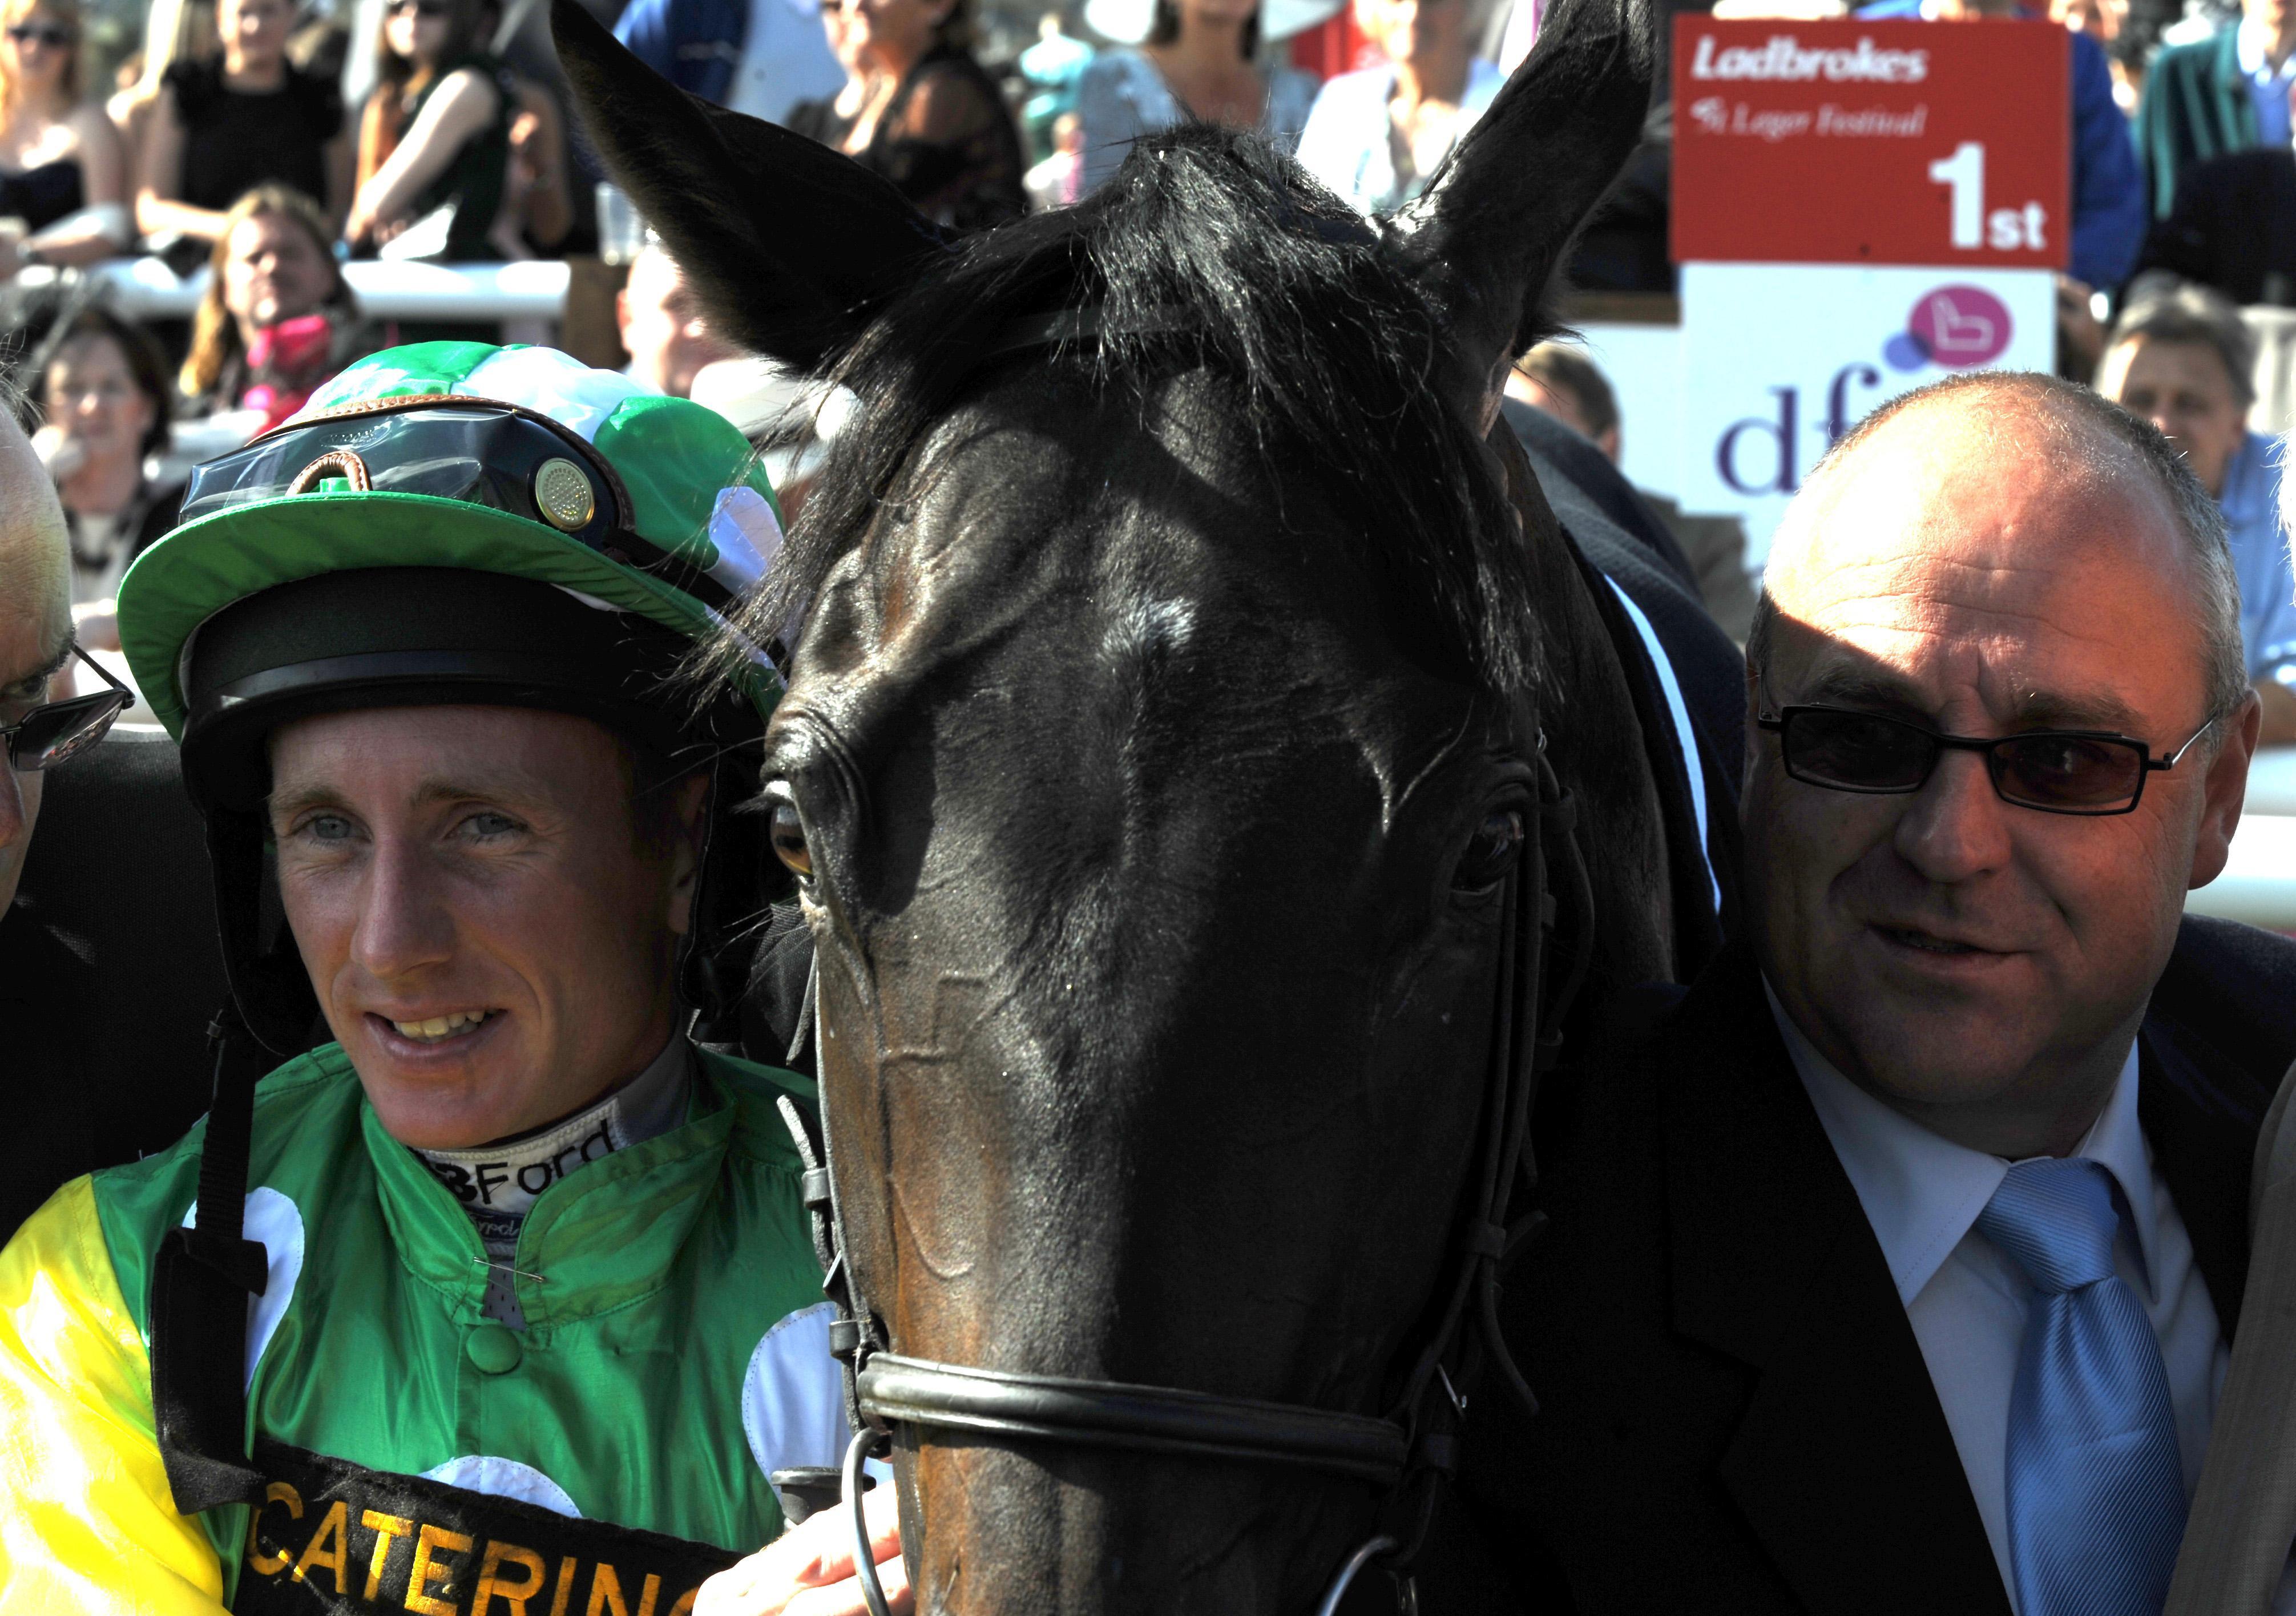 Paul Hanagan (left) and Richard Fahey teamed up to win with Mrs Hoo